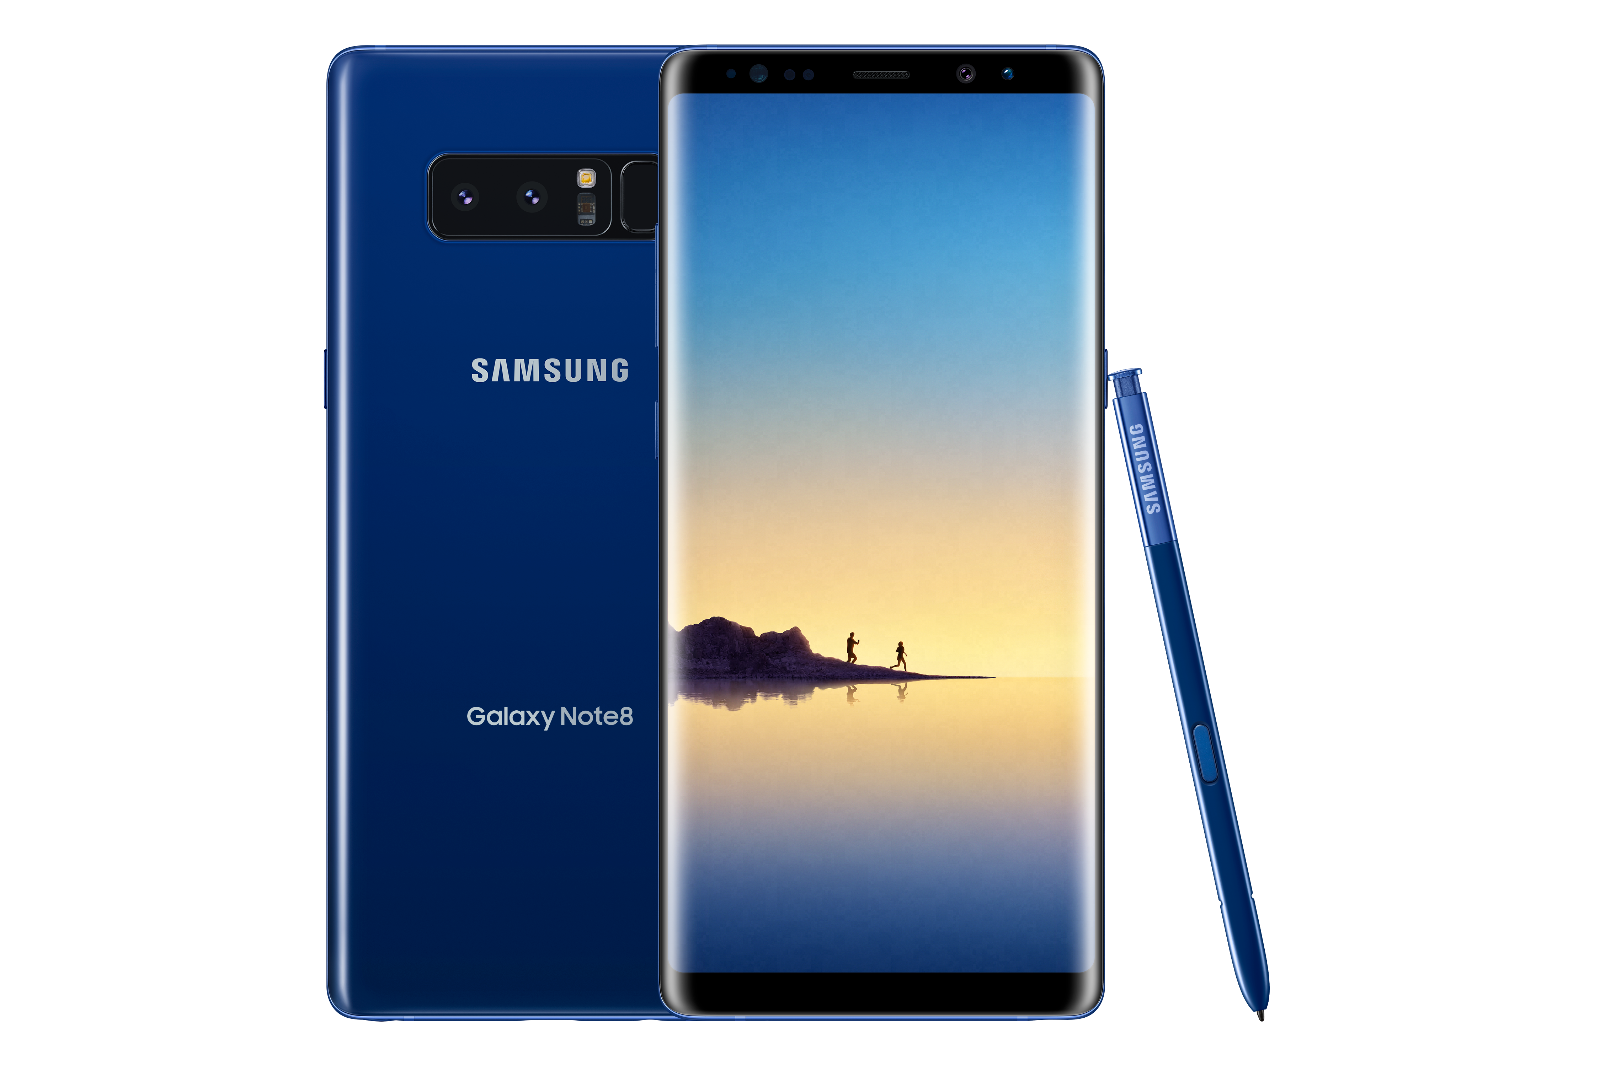 Samsung Galaxy Note8 SM-N950U - 64GB - Black Blue Gray (Verizon) Unlocked B